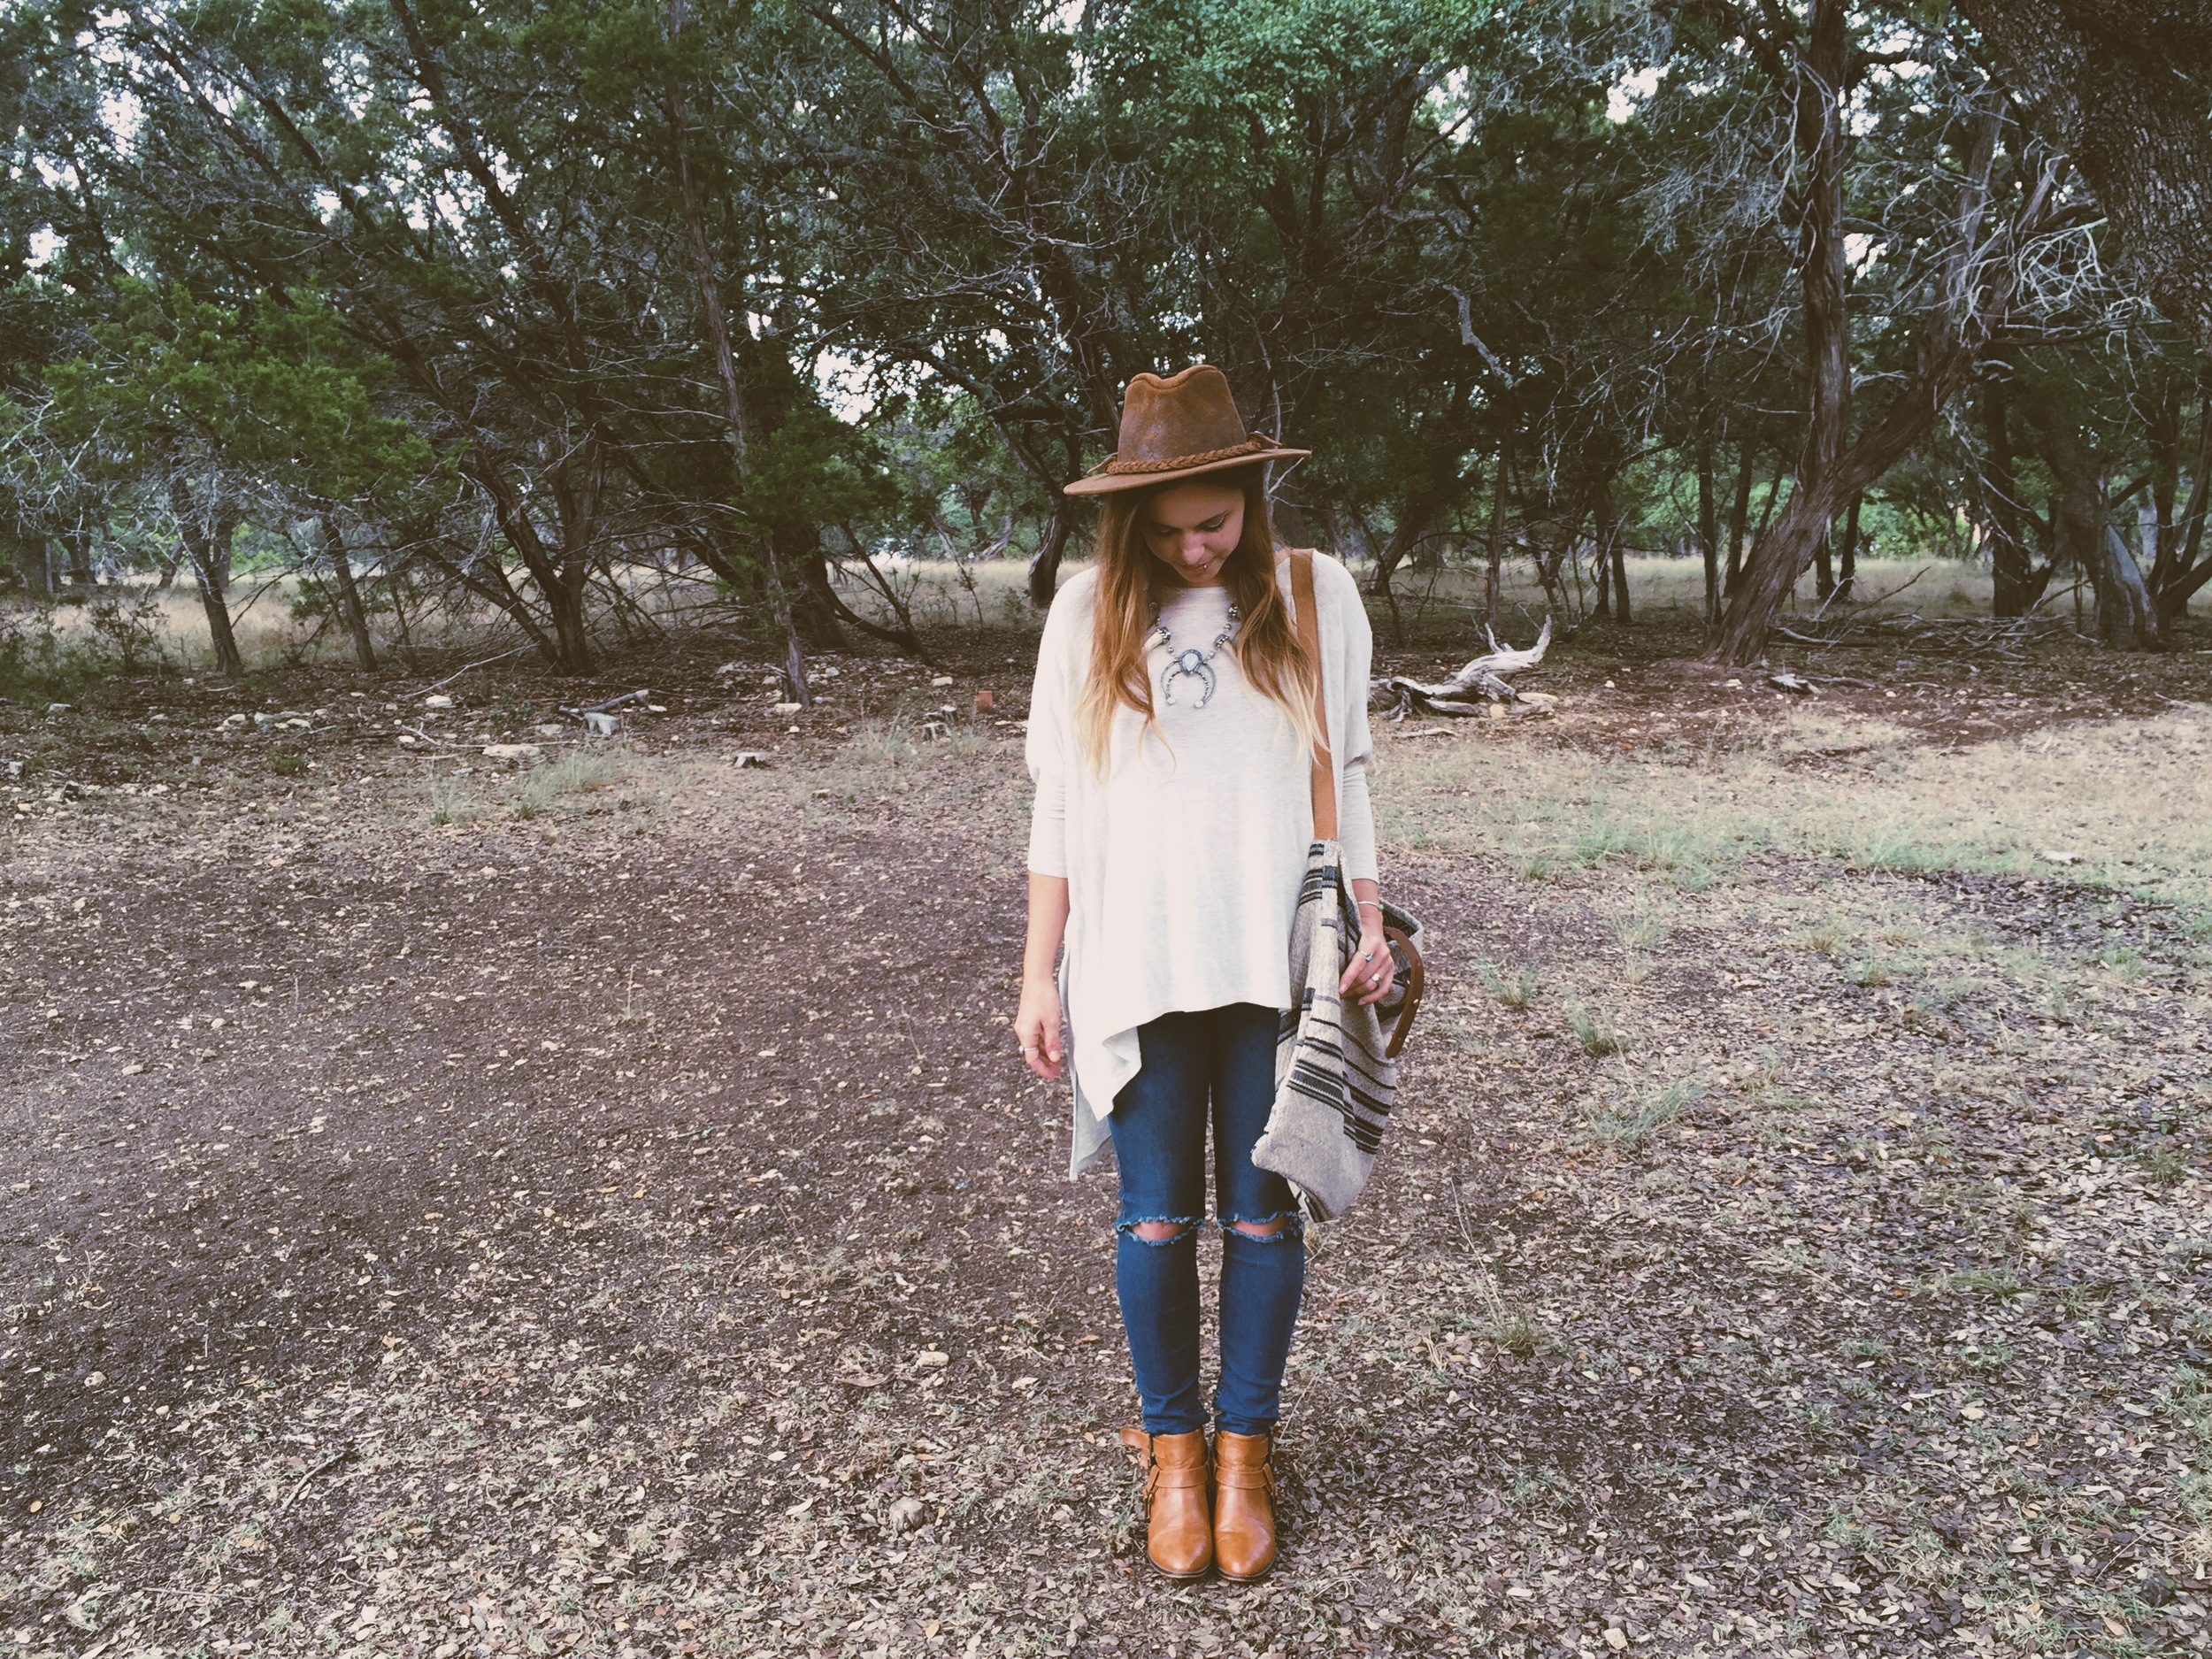 Aurora Shadow Necklace + Moorea Seal Bag + Dolkii Jeans + Free People Hat